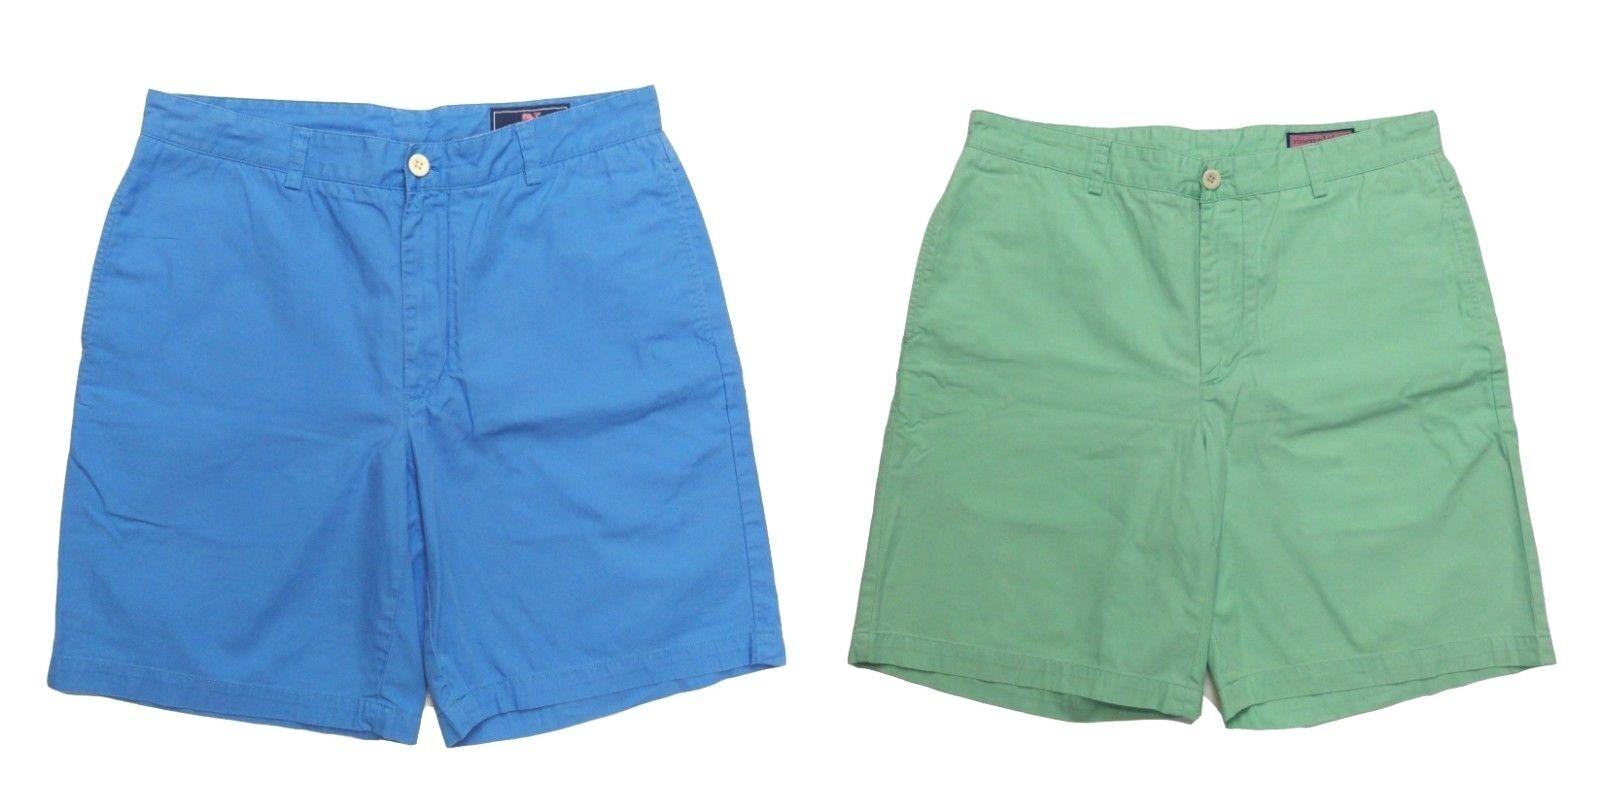 Lot of 2 Vineyard Vines Men's 34 Pastel Green bluee 100% Cotton Casual Shorts EUC